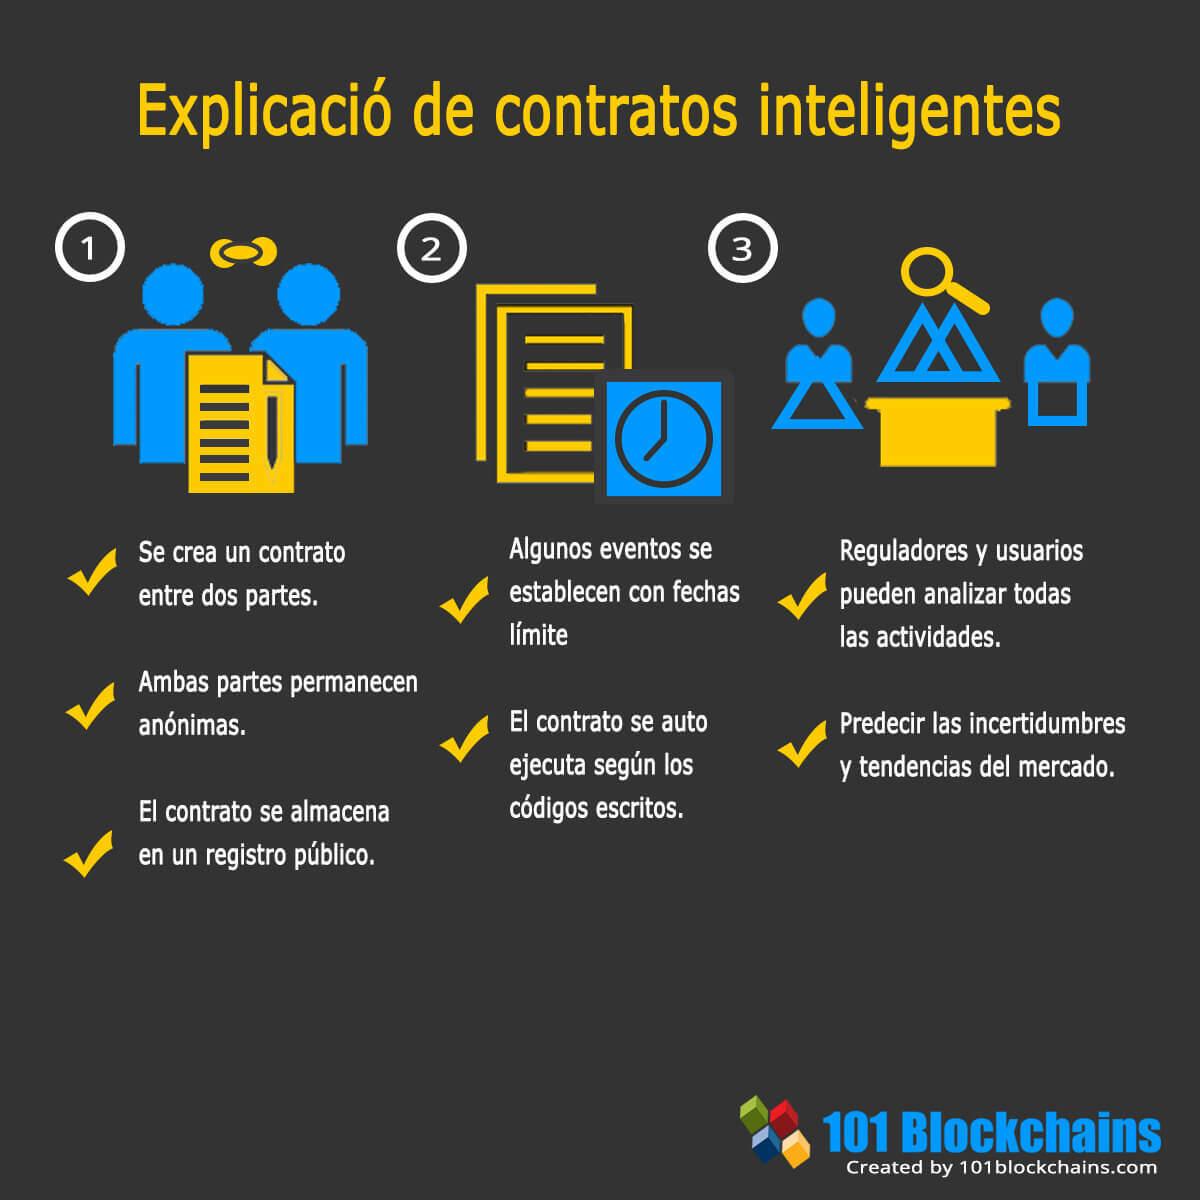 Explicació de contratos inteligentes